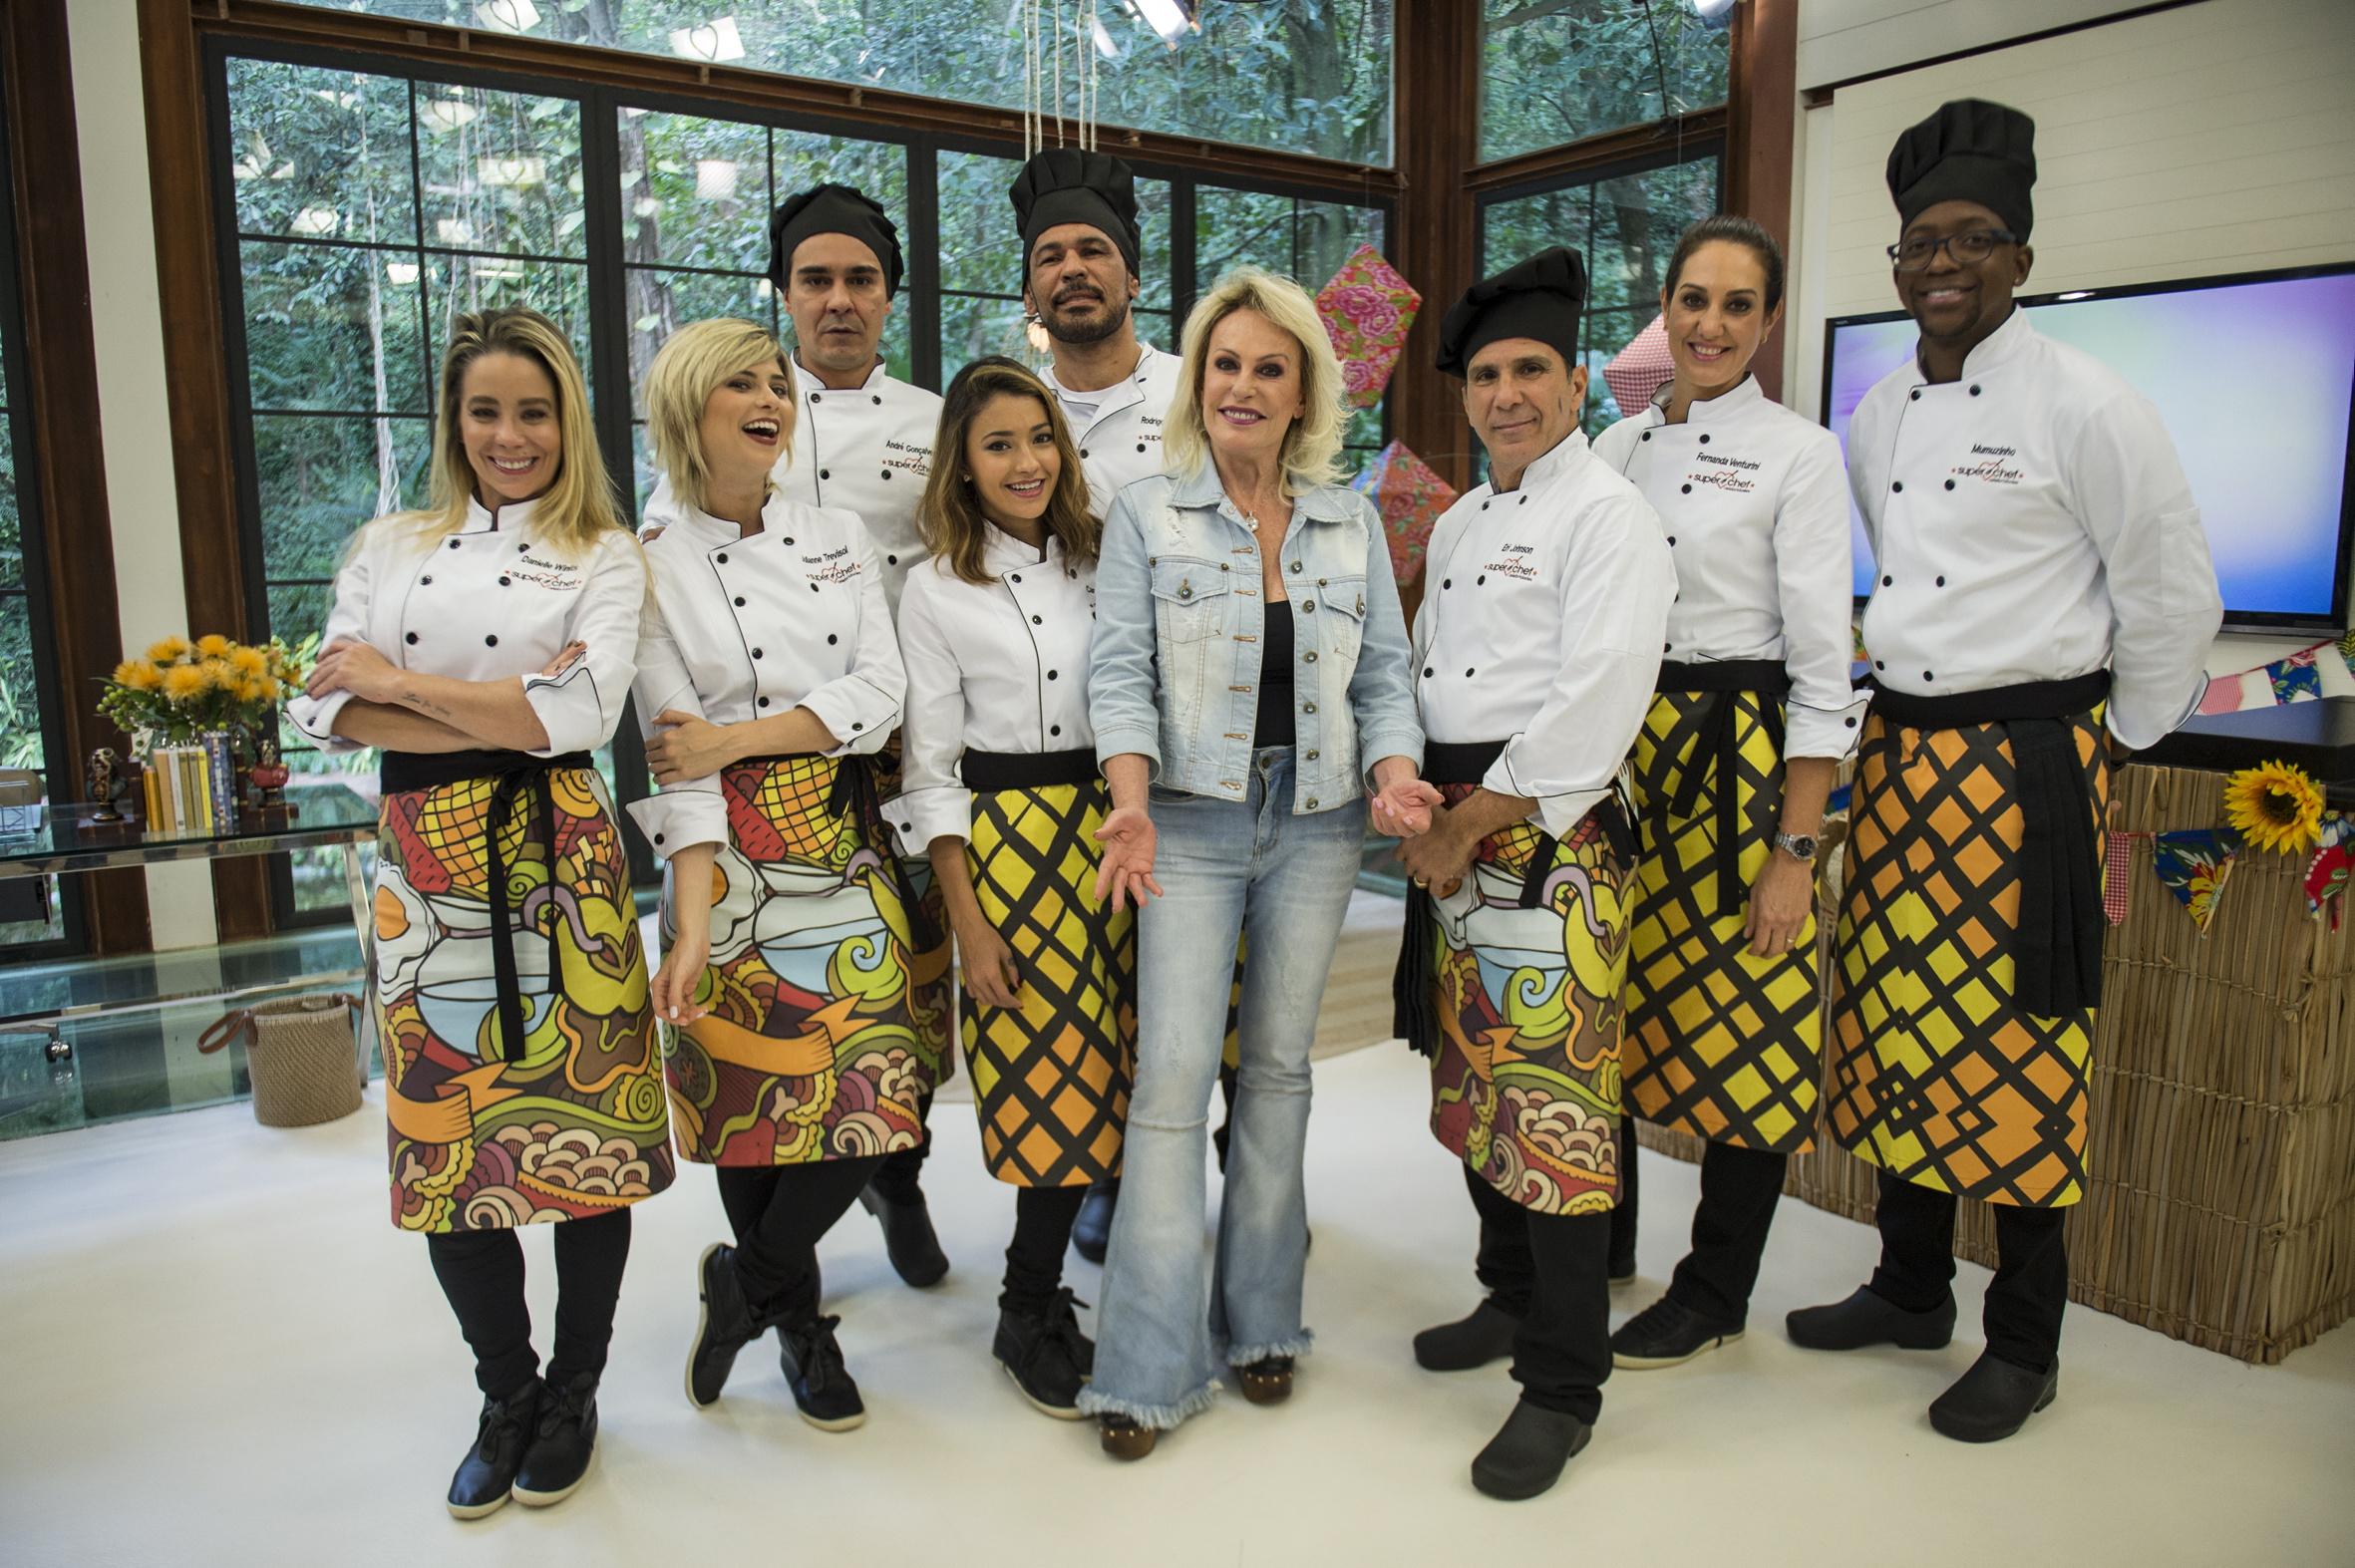 Ana Maria Braga (ao centro) com os oito participantes desta edição (Fotos: Renato Rocha Miranda/Globo)